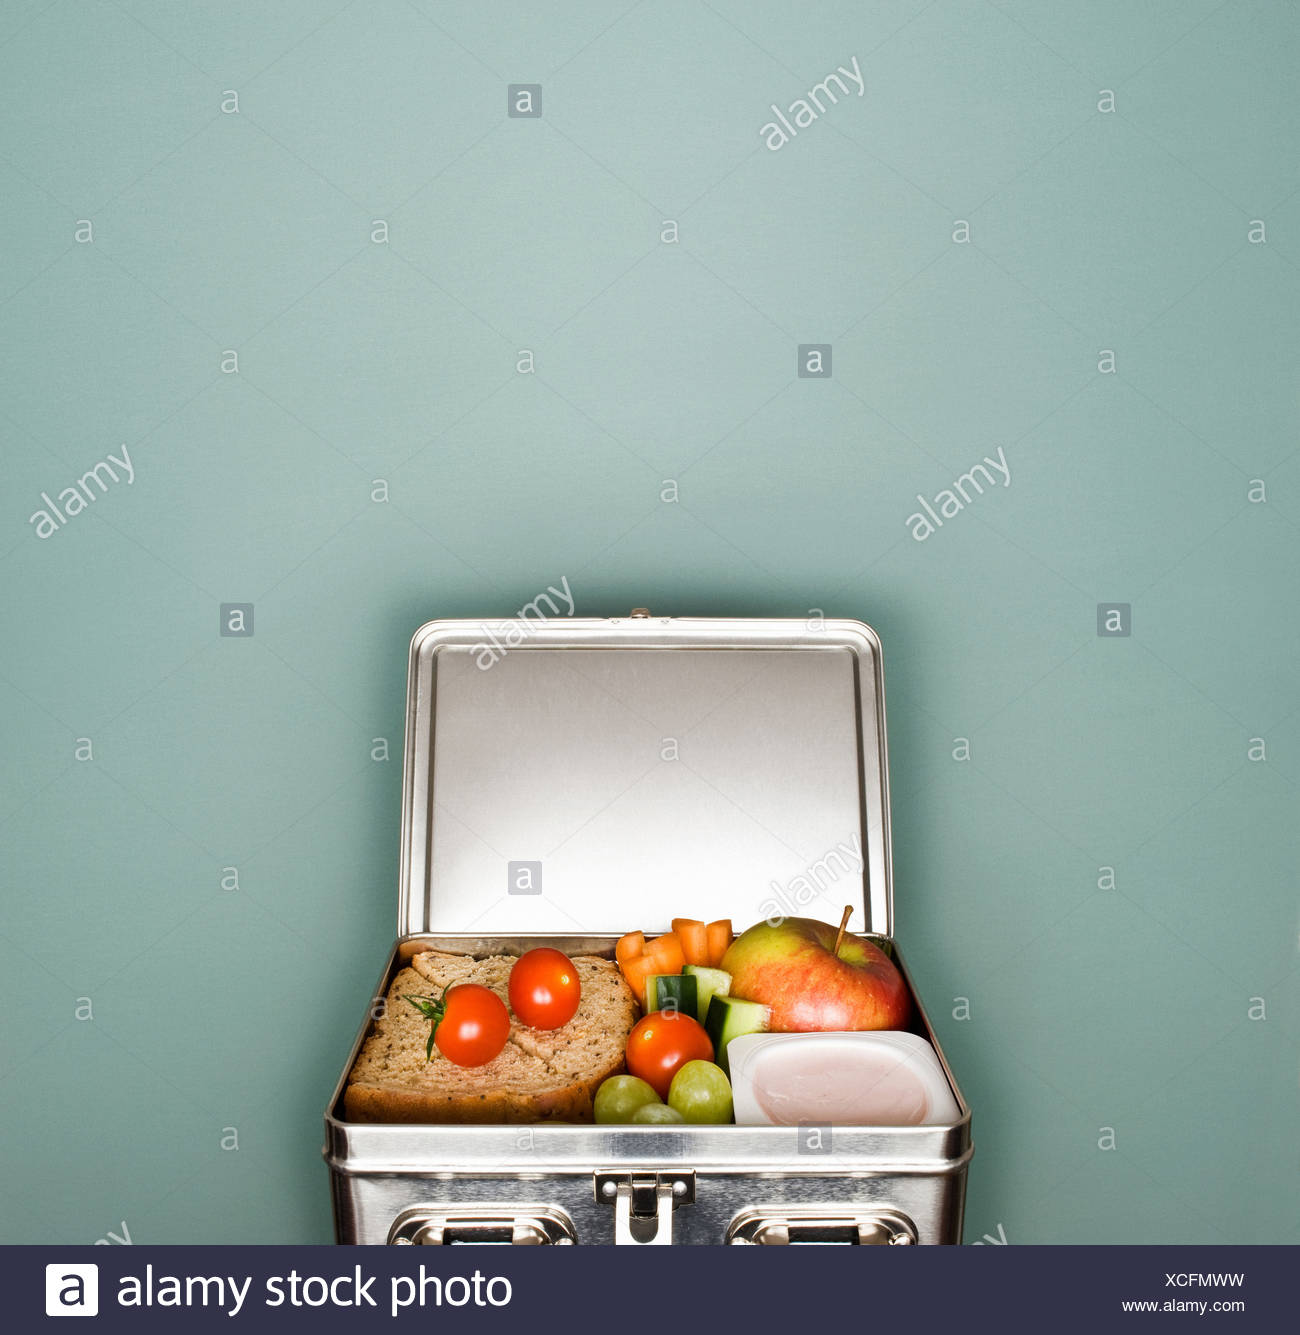 Una caja de almuerzo Imagen De Stock